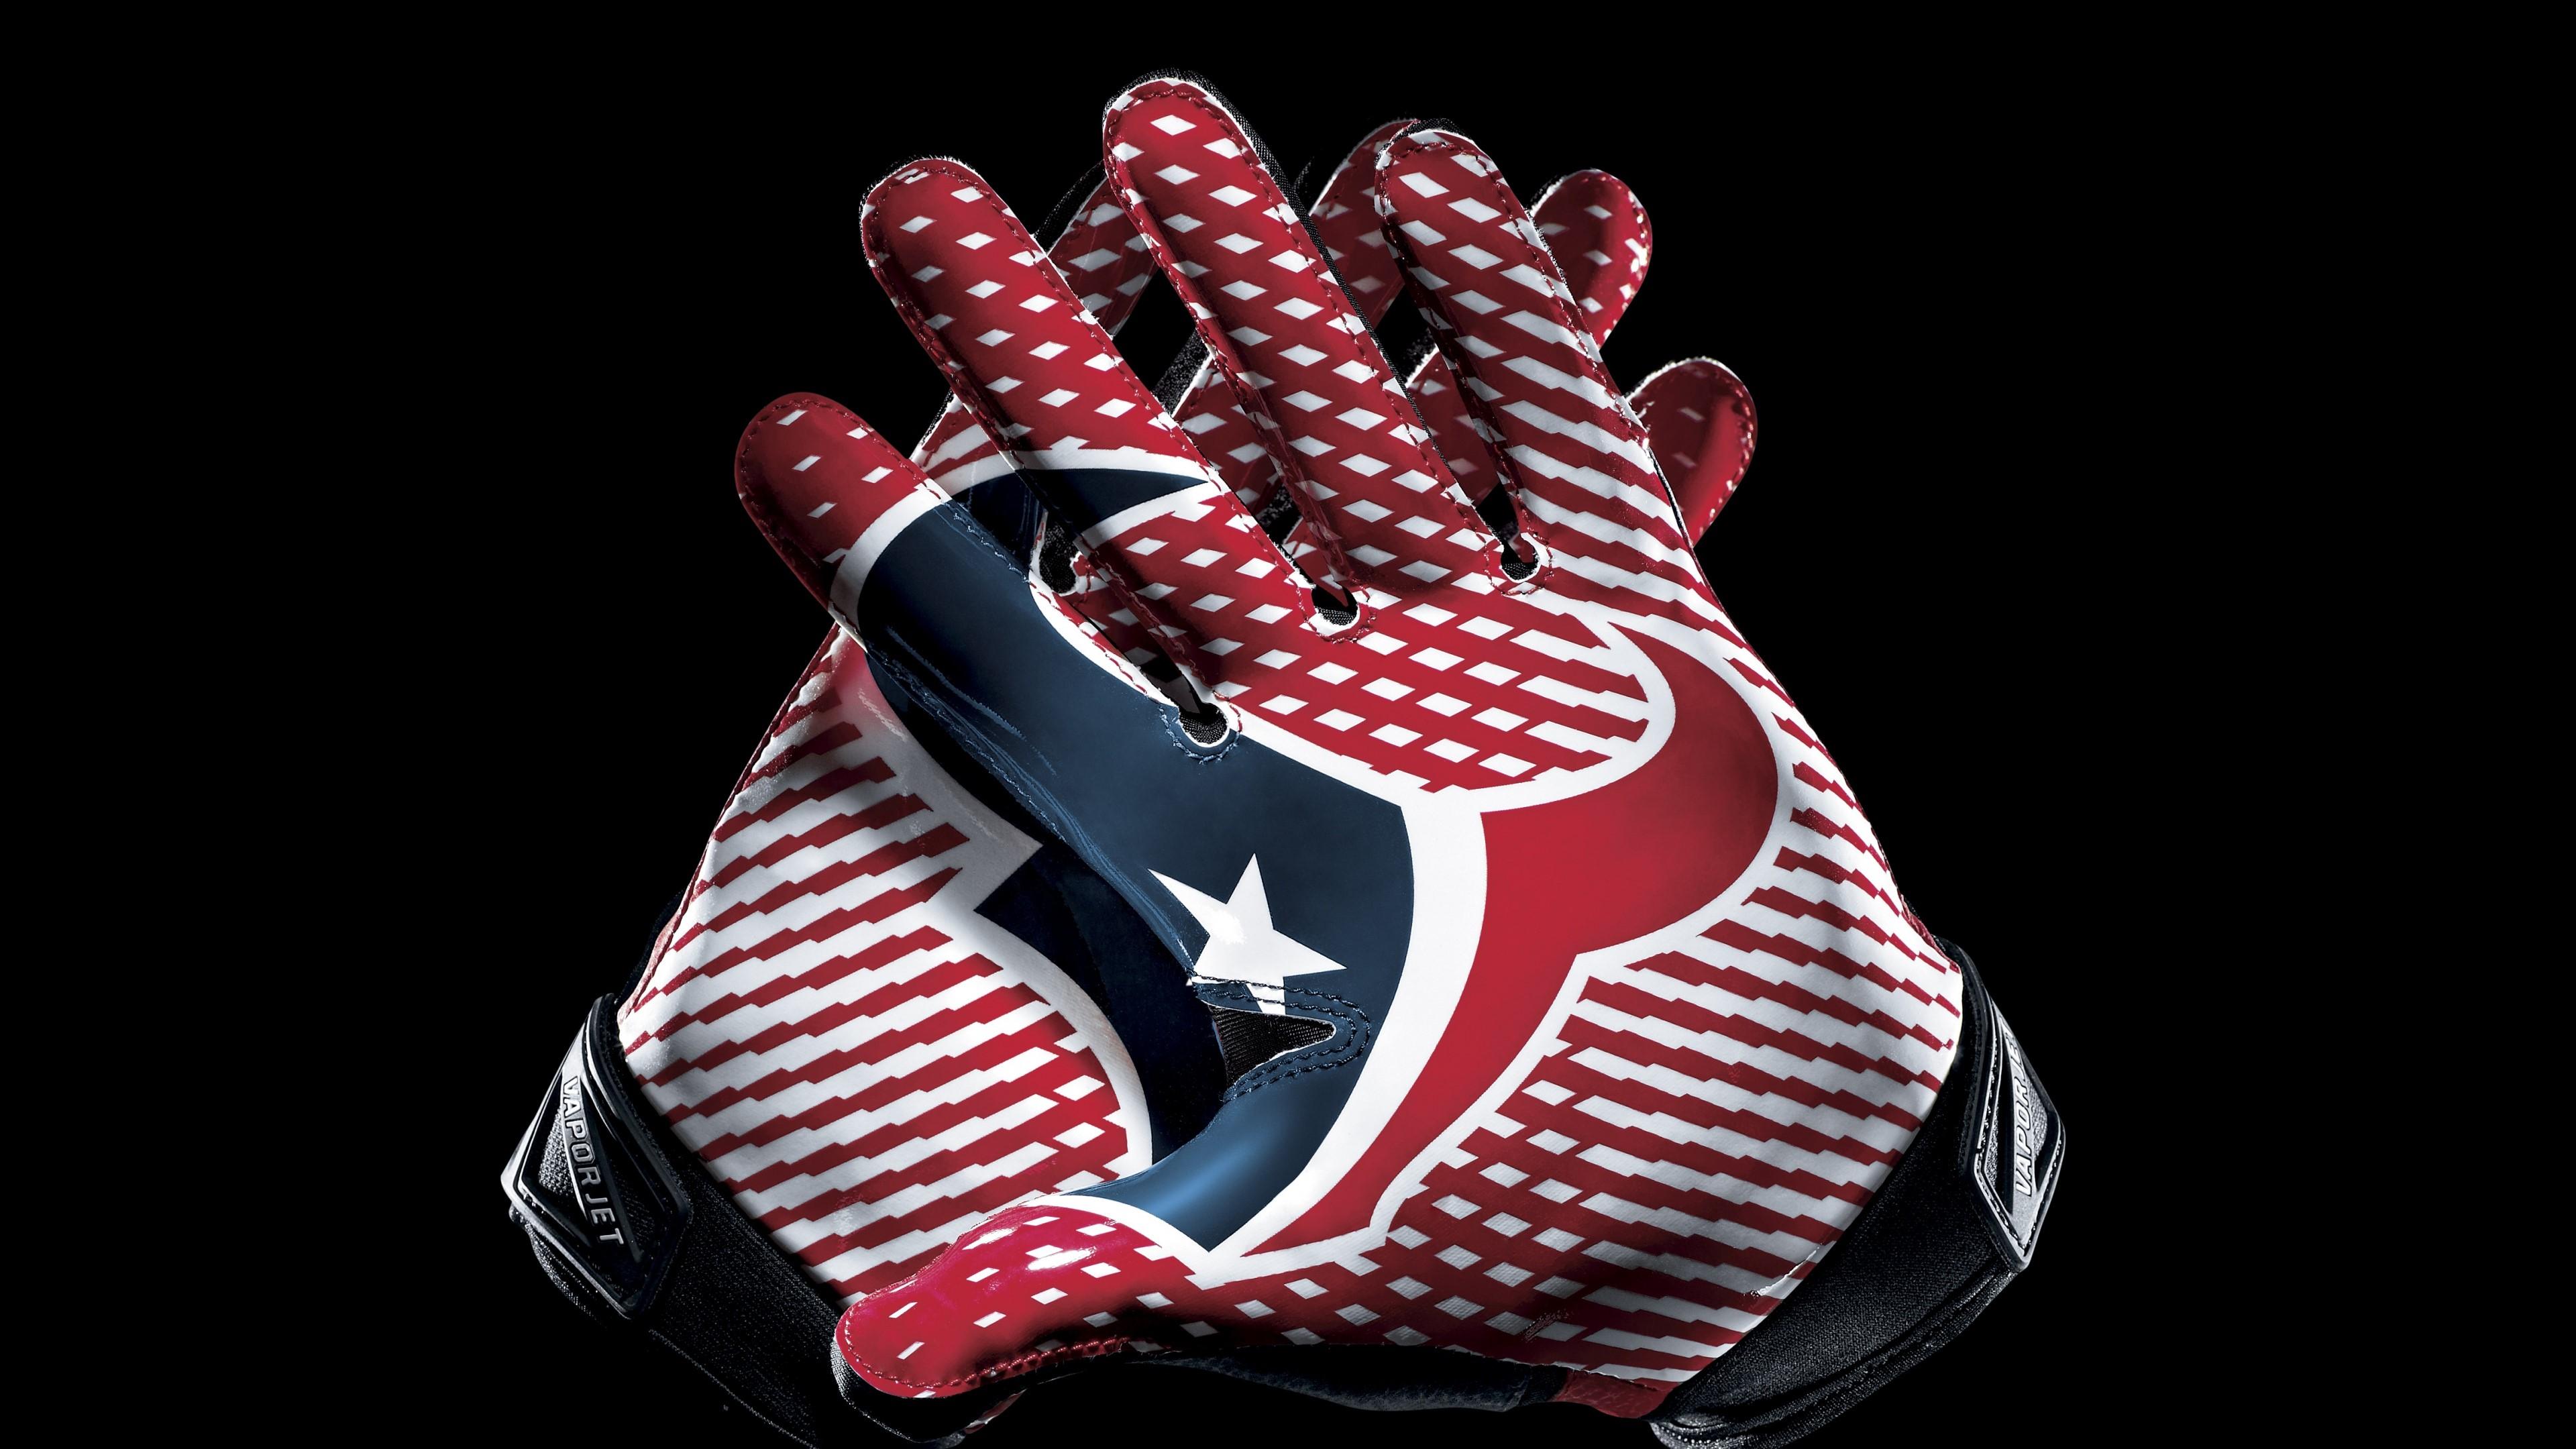 Fondo de pantalla de Logo de Texas en guantes de futbol Imágenes